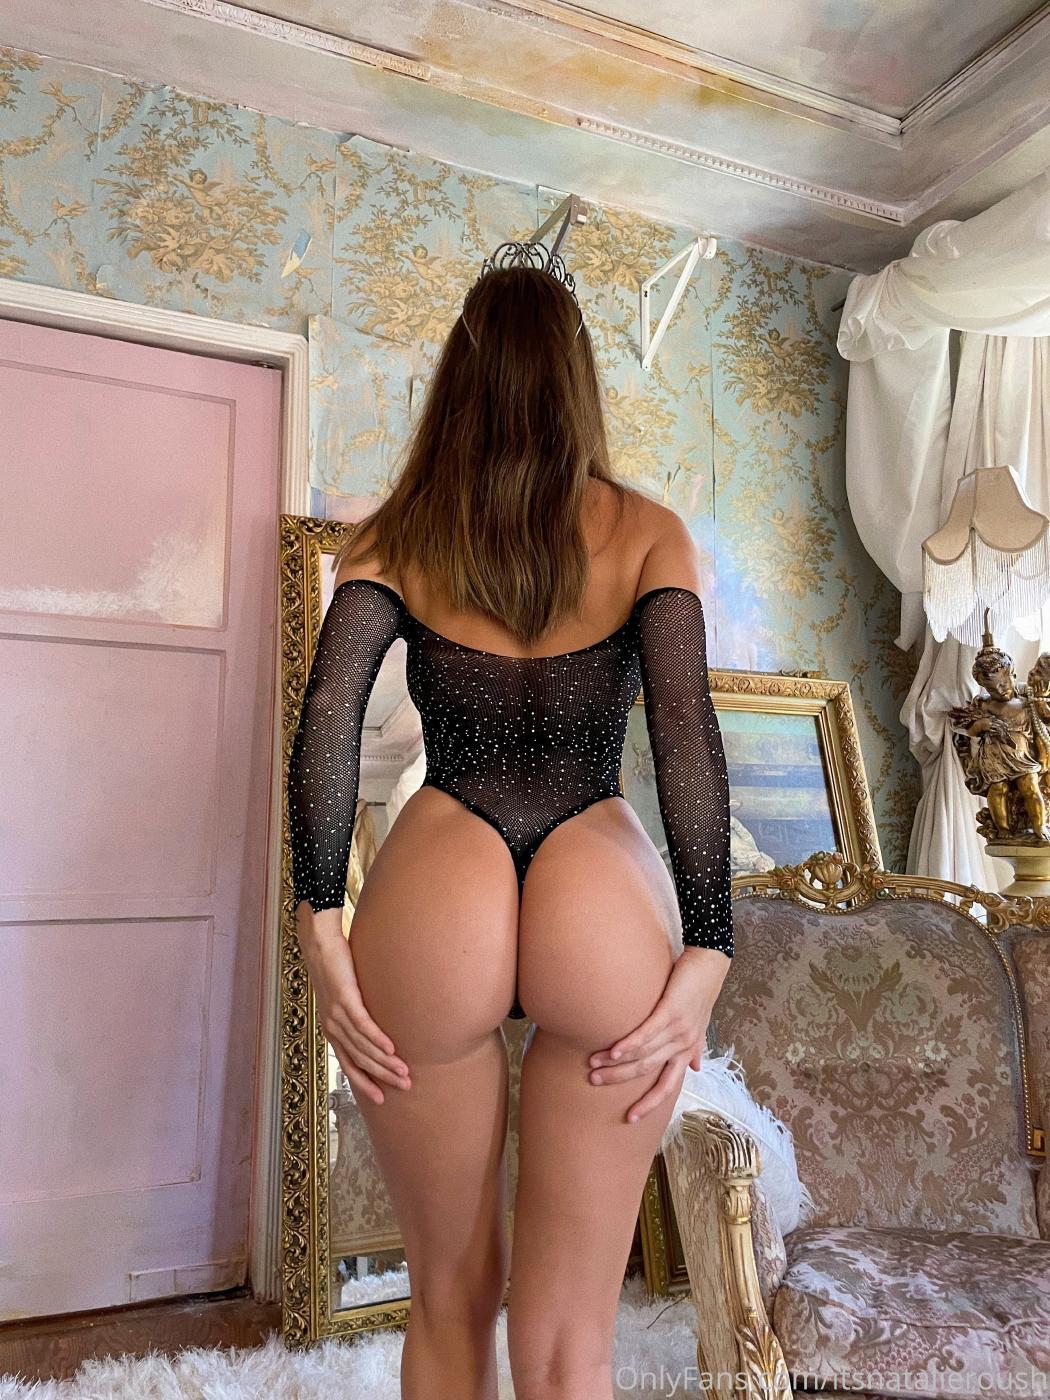 Natalie Roush Nude Fishnet Onlyfans Set Leaked Eplxki